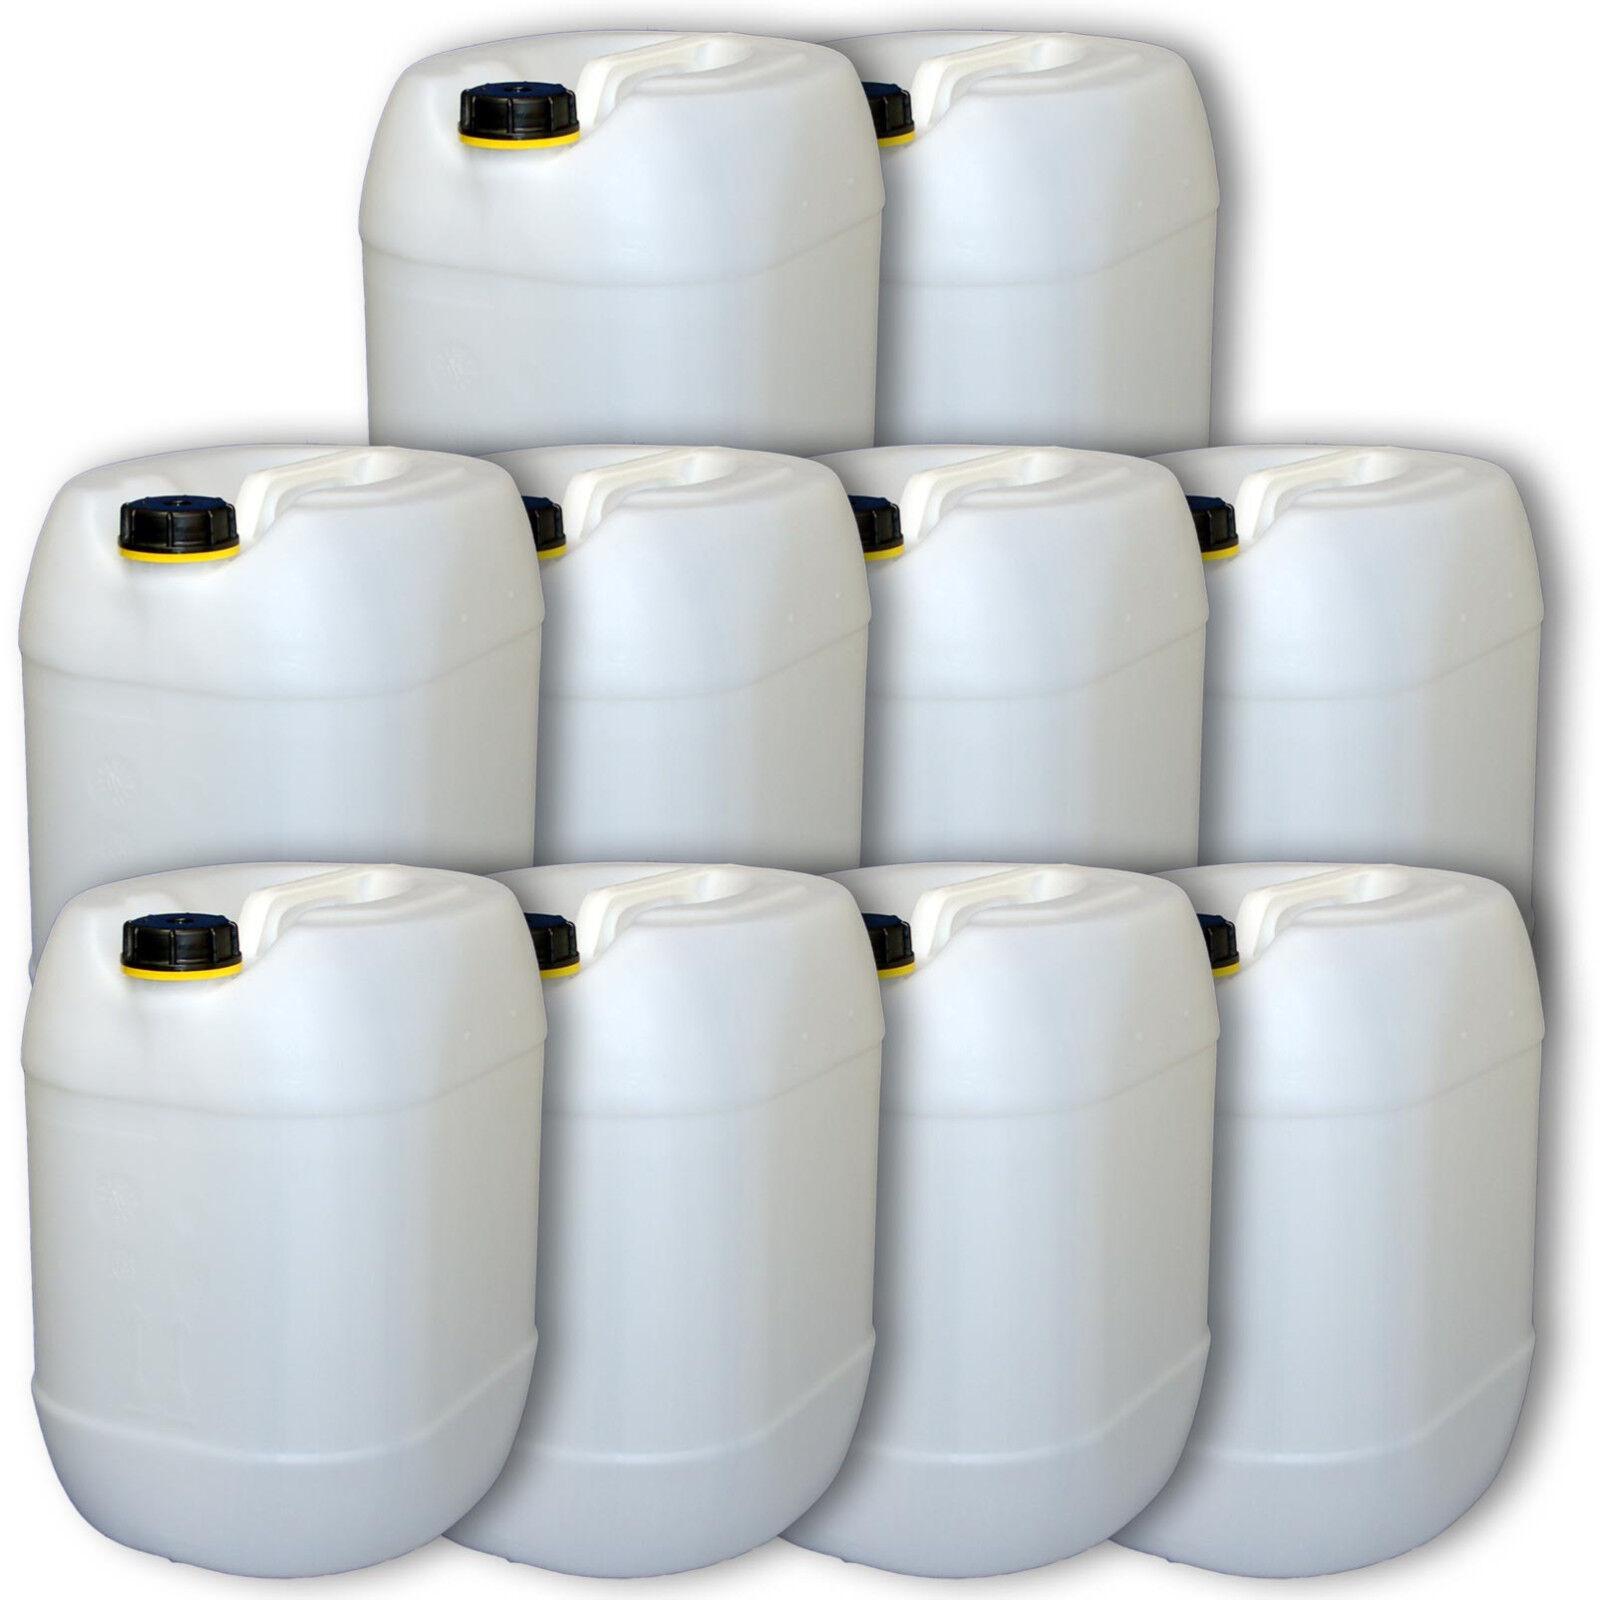 Pacco 10er Contenitore Bevee taniche per l'acqua naturale 30 litri di materiale di plastica roautobusta